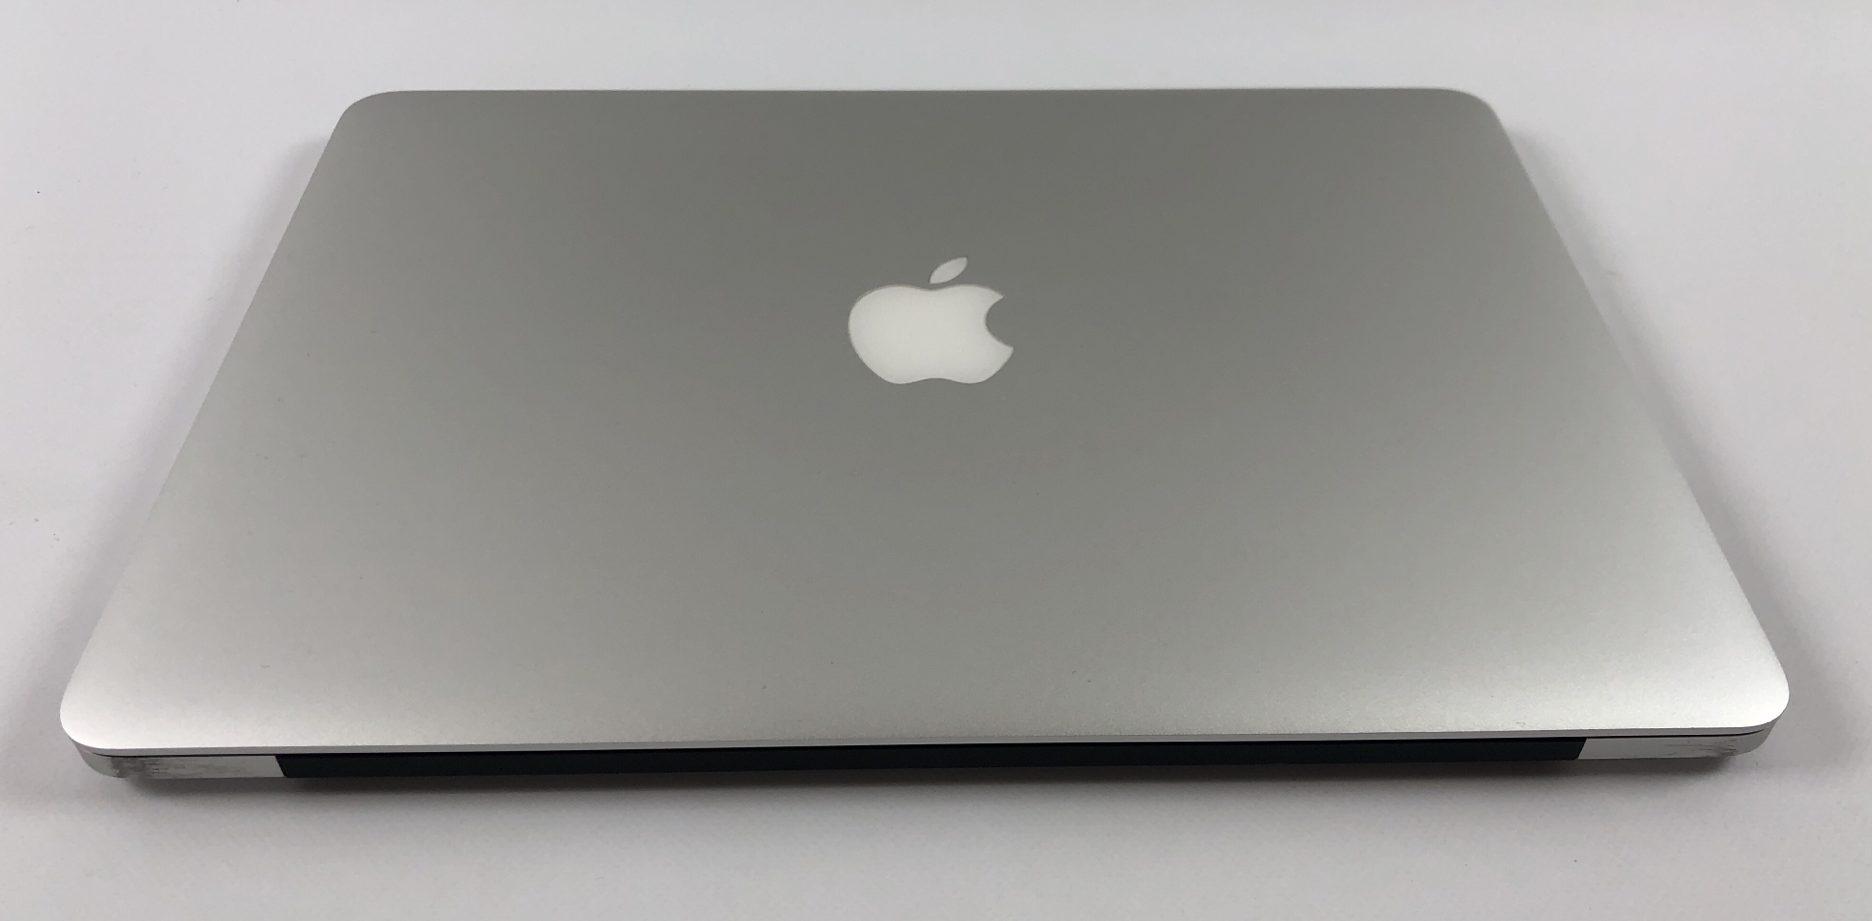 "MacBook Pro Retina 13"" Mid 2014 (Intel Core i5 2.6 GHz 8 GB RAM 128 GB SSD), Intel Core i5 2.6 GHz, 8 GB RAM, 128 GB SSD, Kuva 2"